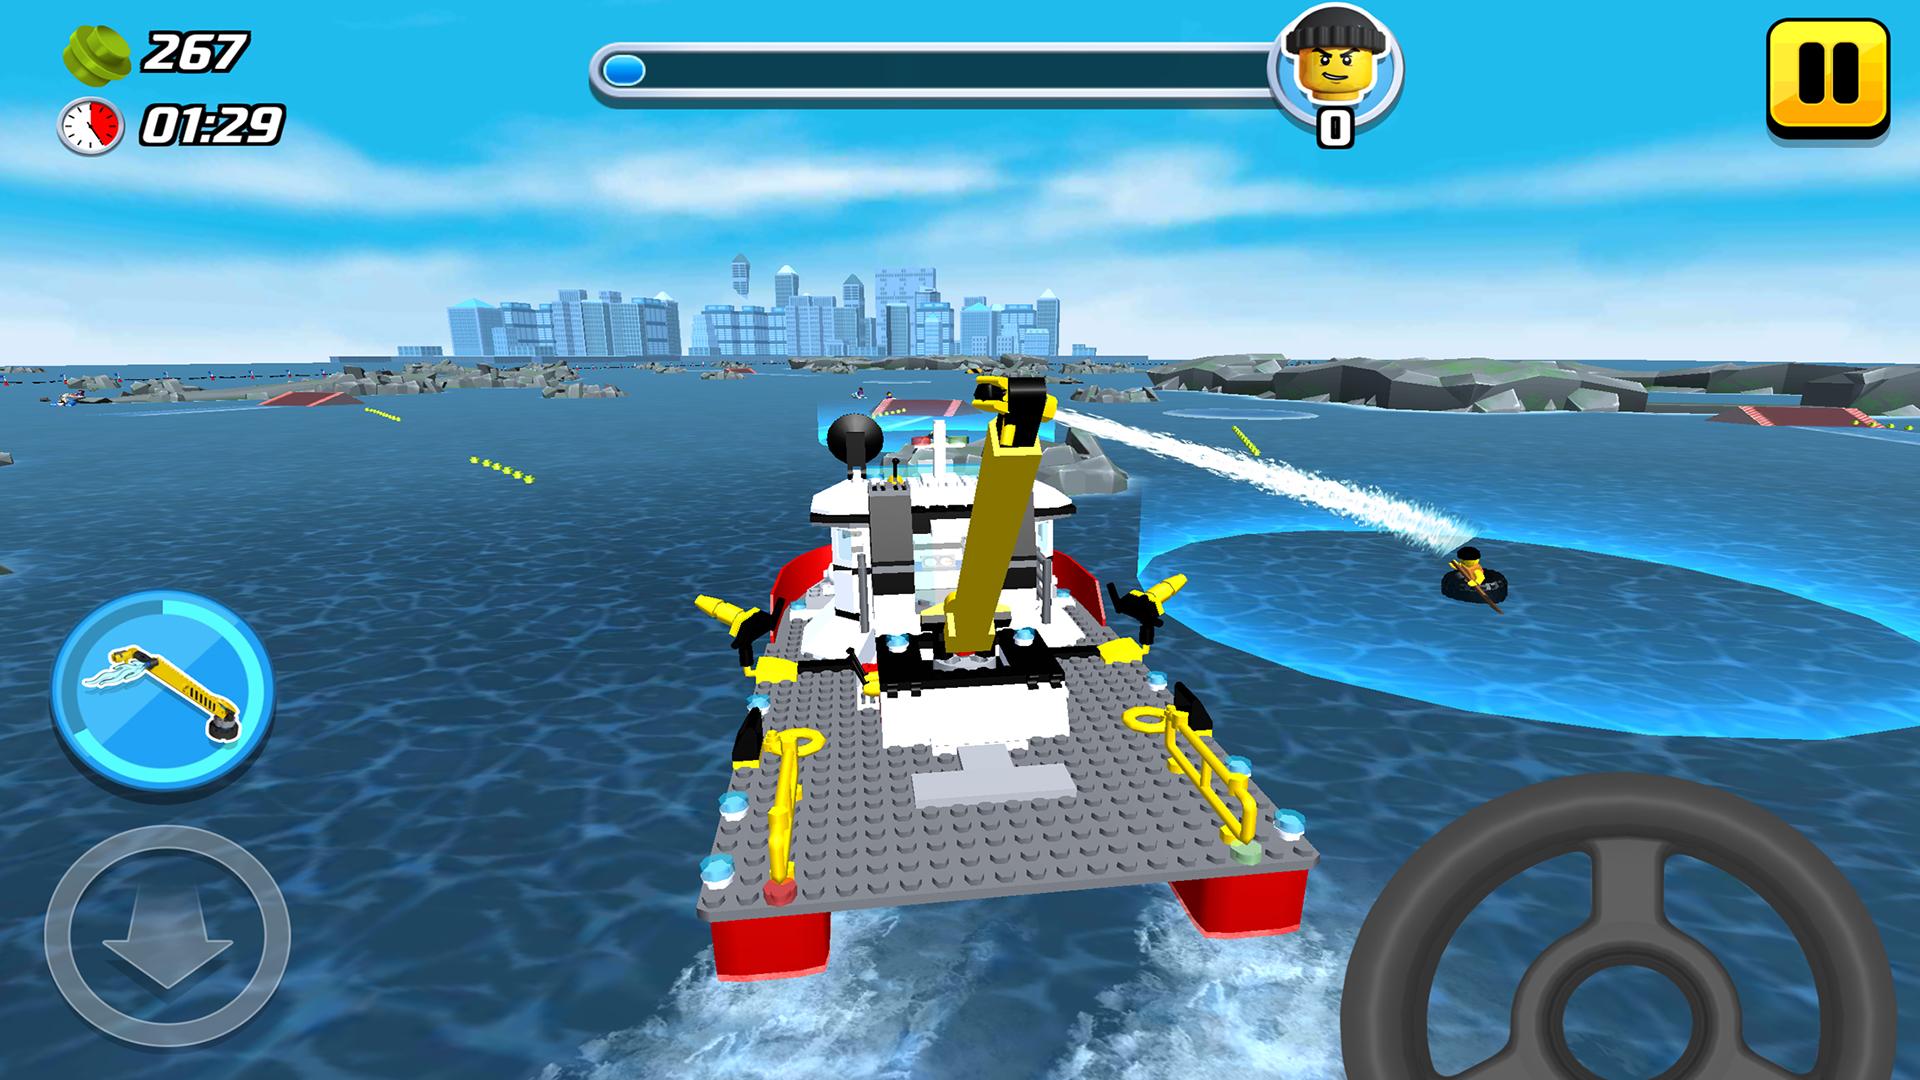 LEGO® City game screenshot 12